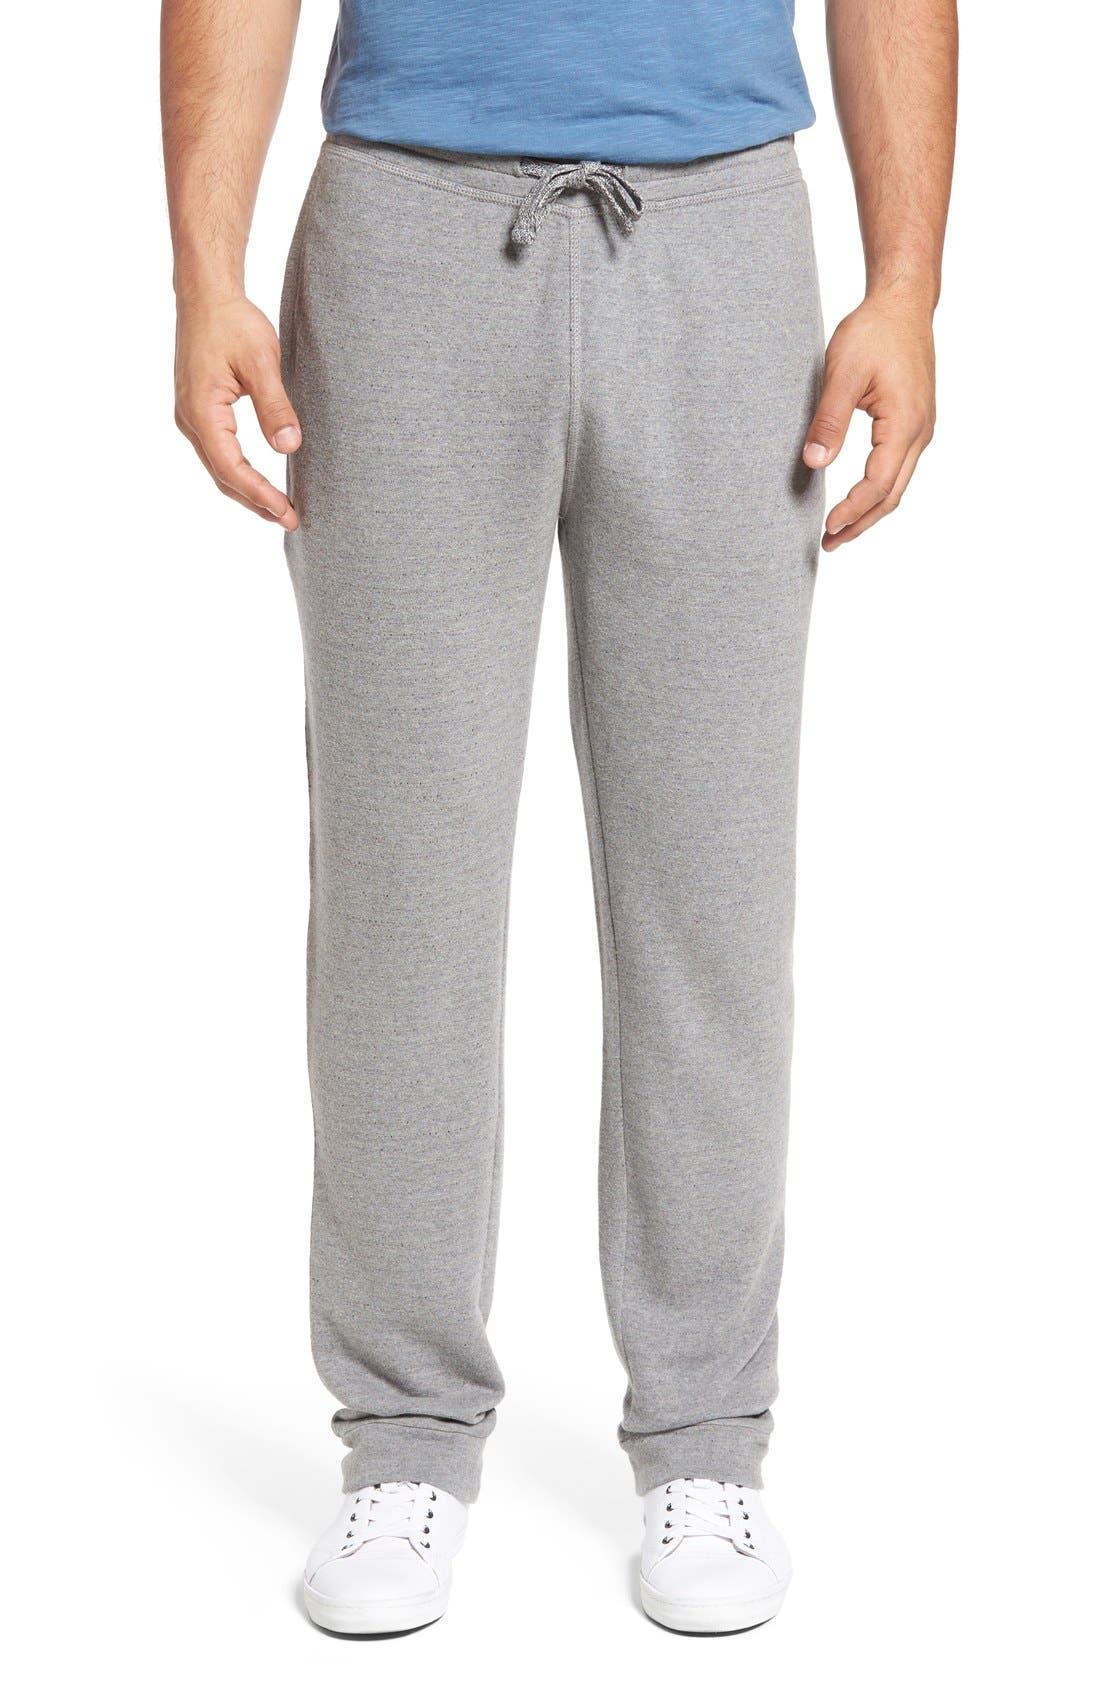 Main Image - Cutter & Buck 'Gleann' Knit Pants